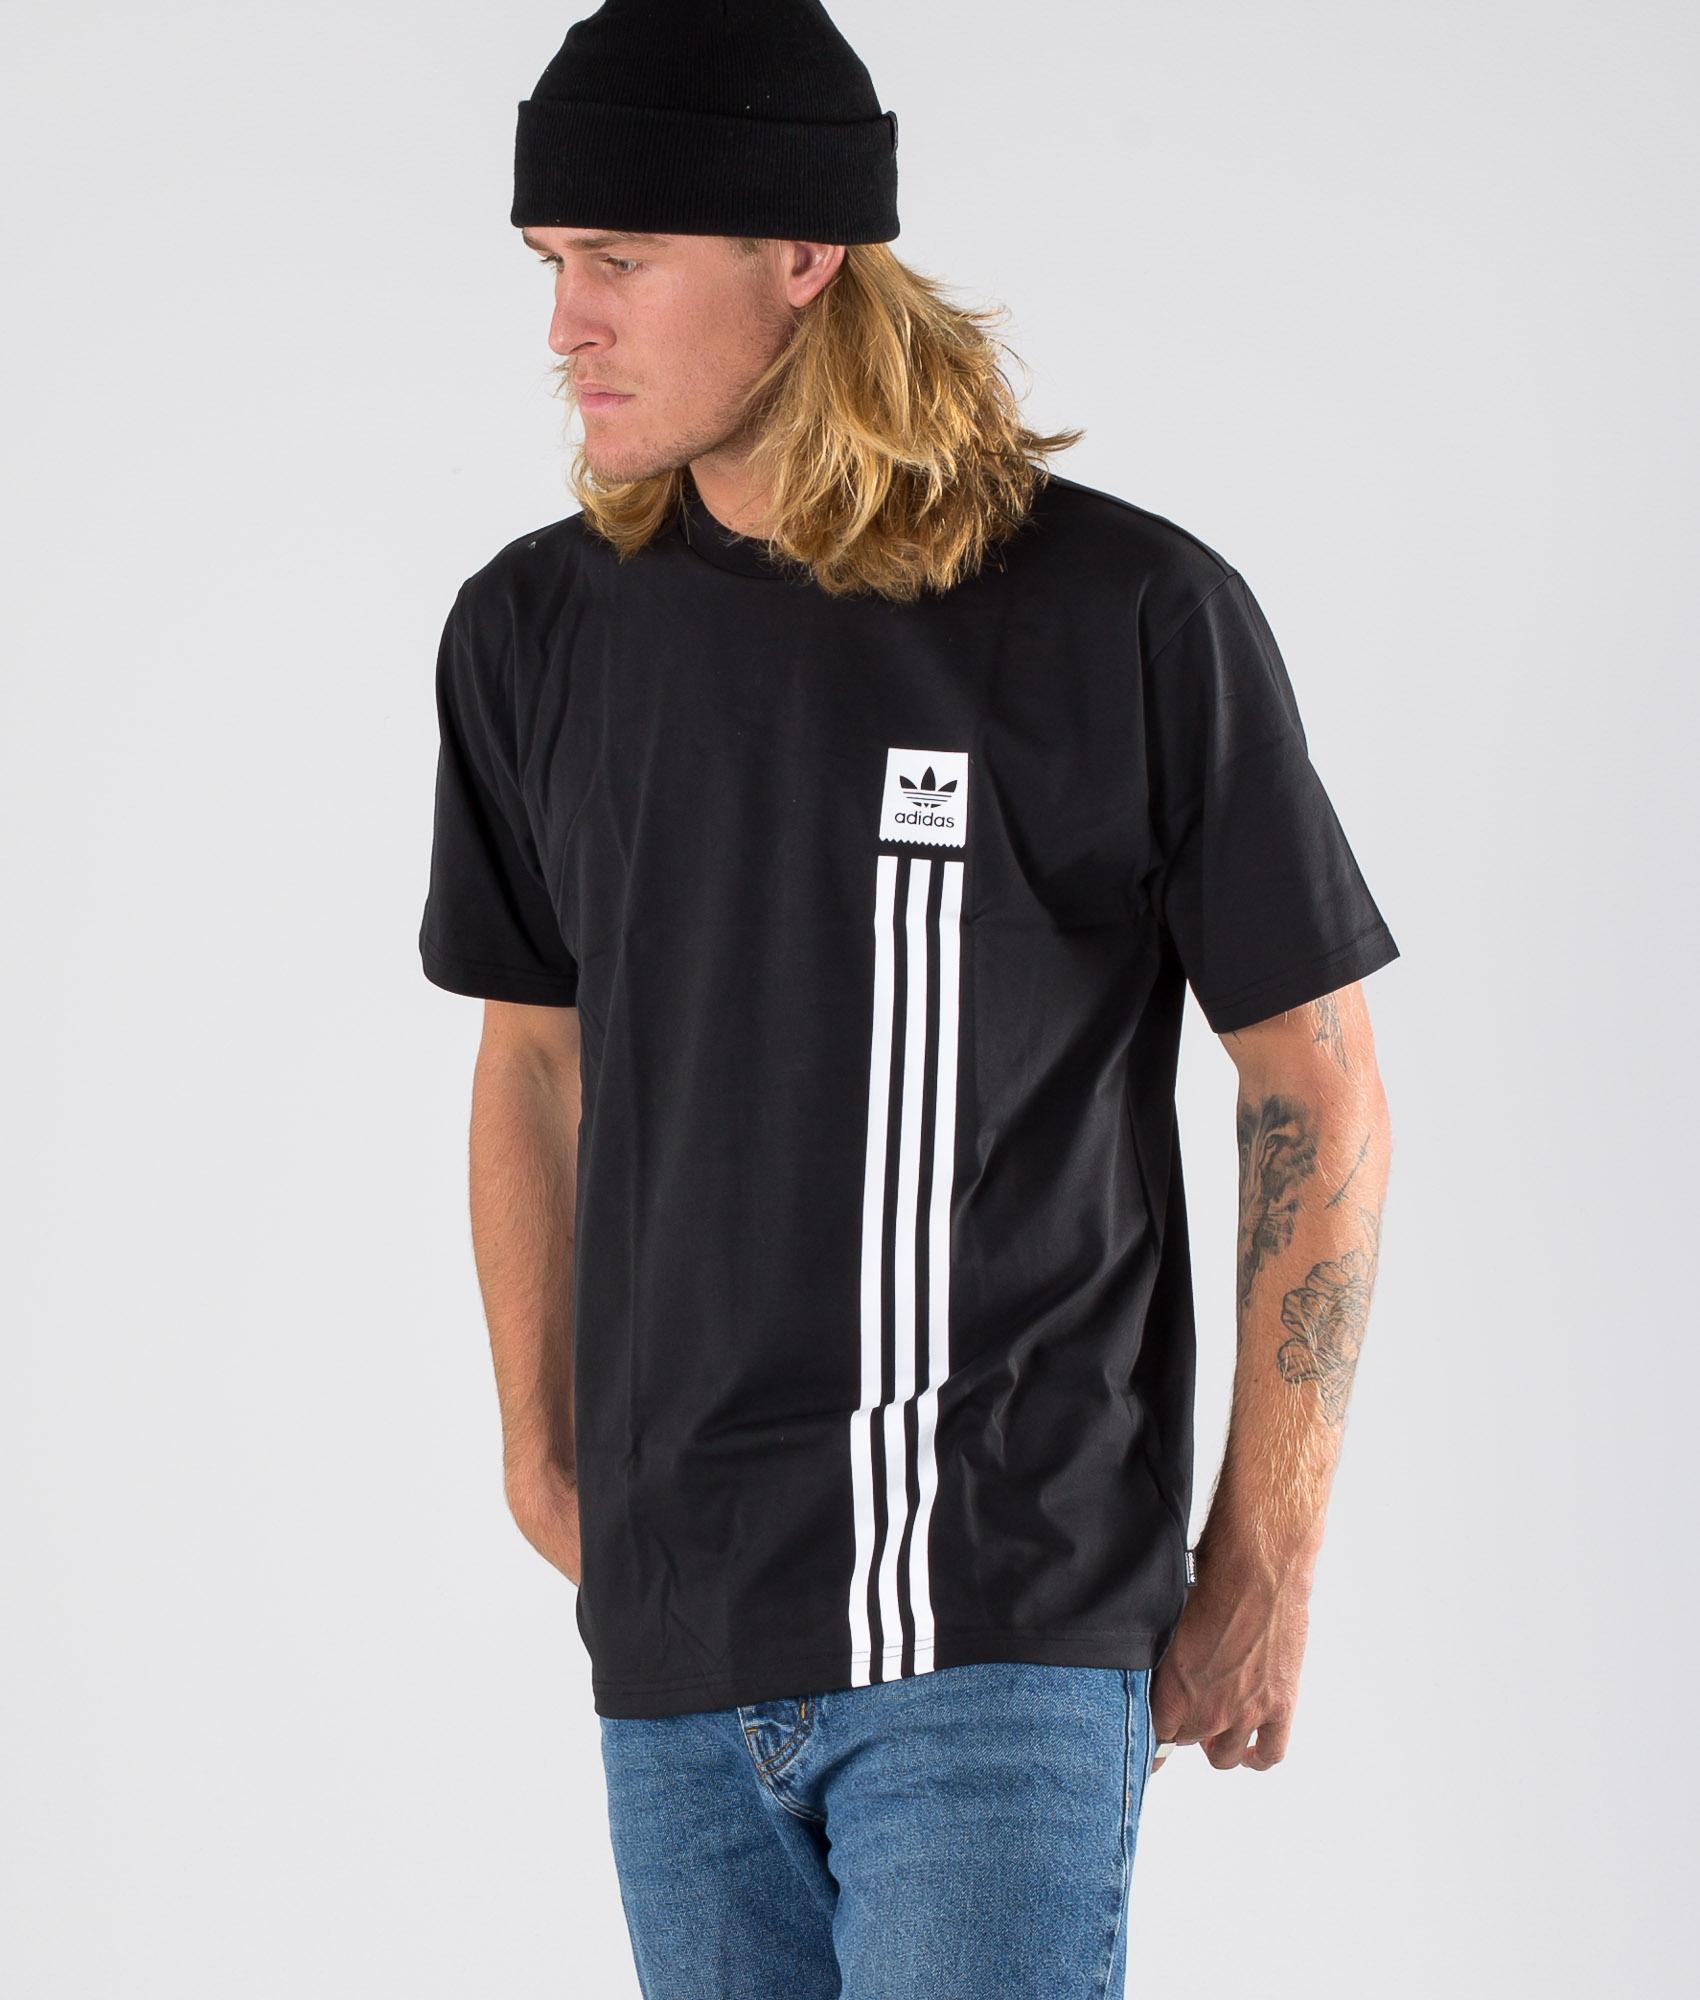 Adidas Skateboarding BB Pillar Tee T shirt BlackWhite